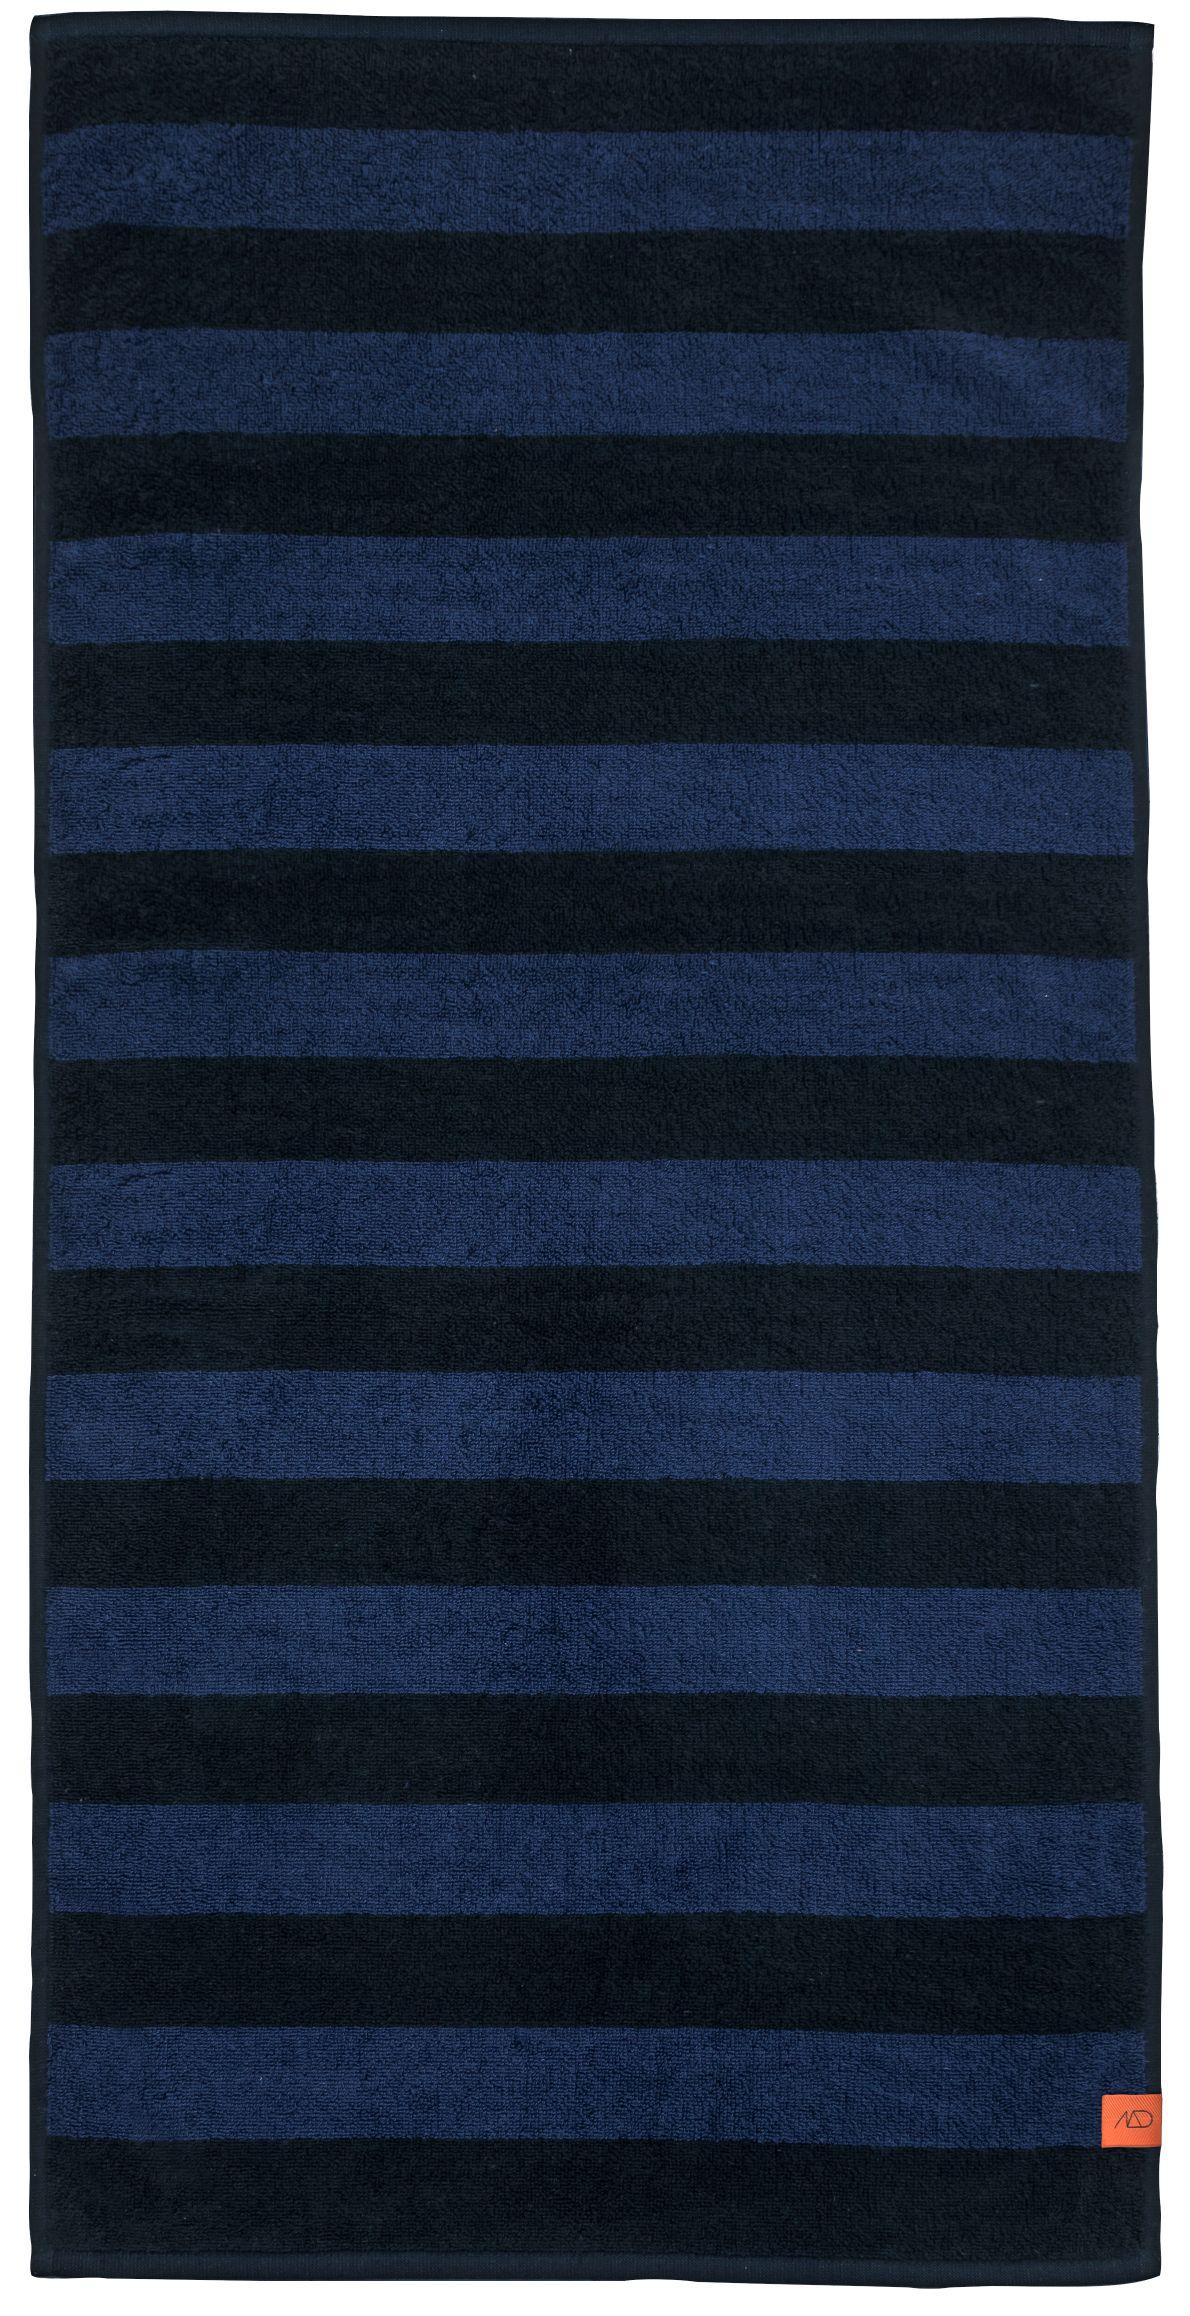 Mette Ditmer Aros håndklæde, 70x135 cm, blå